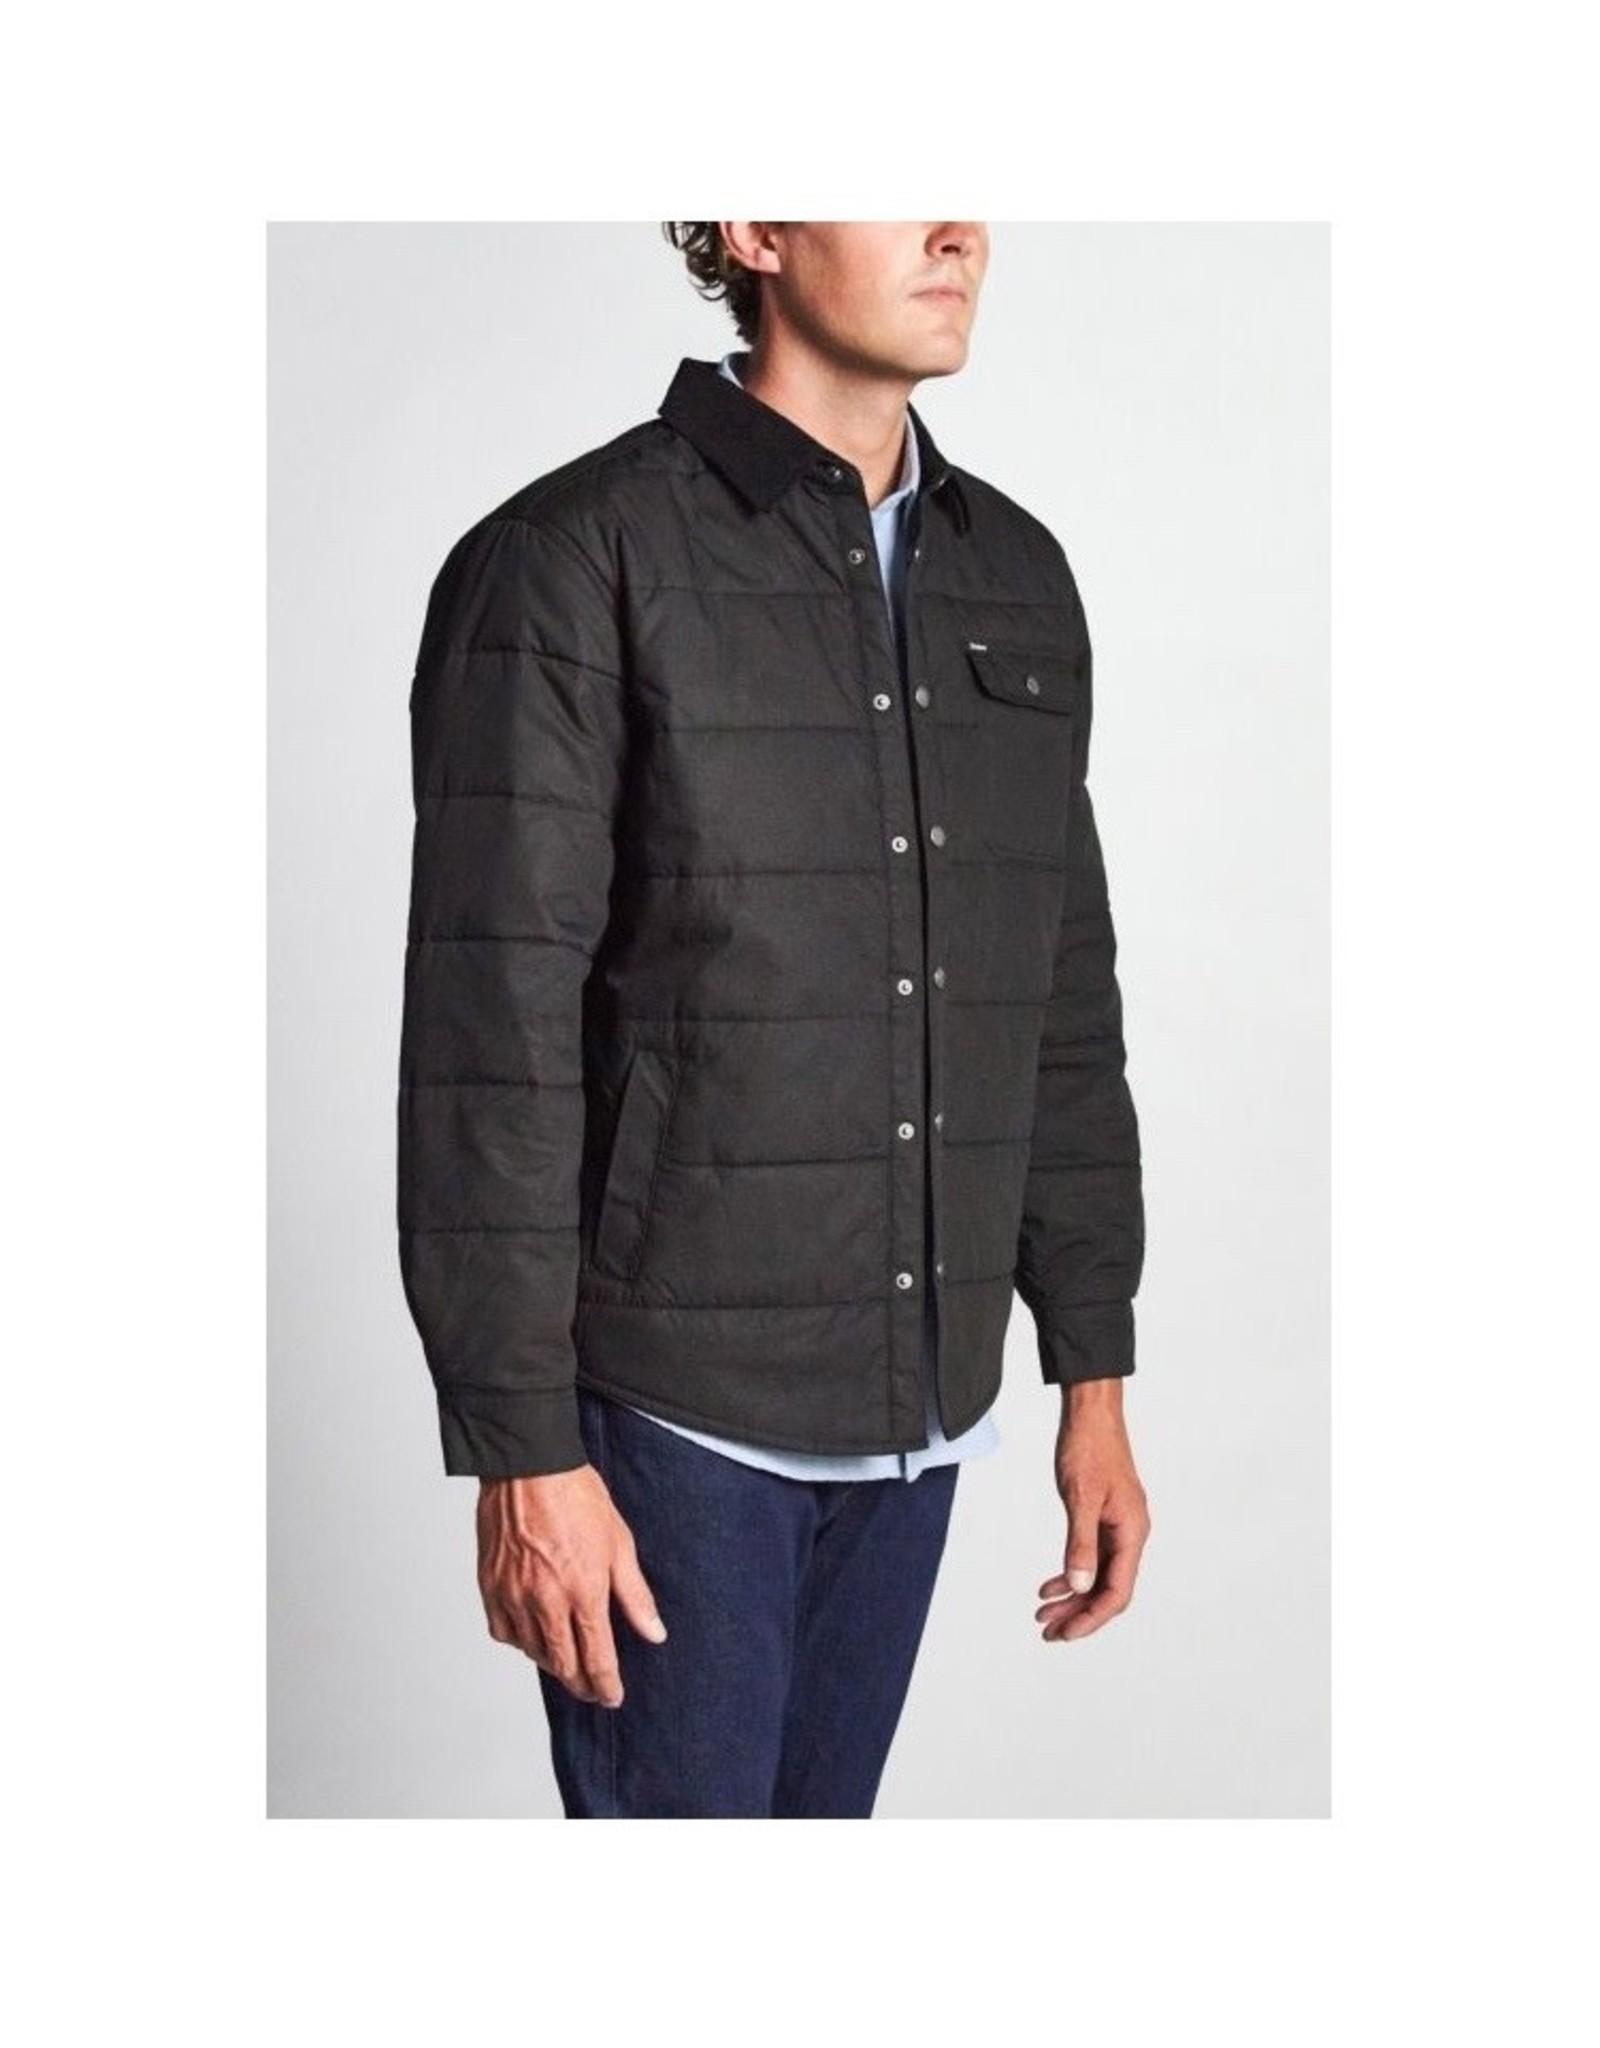 BRIXTON The Cass Jacket